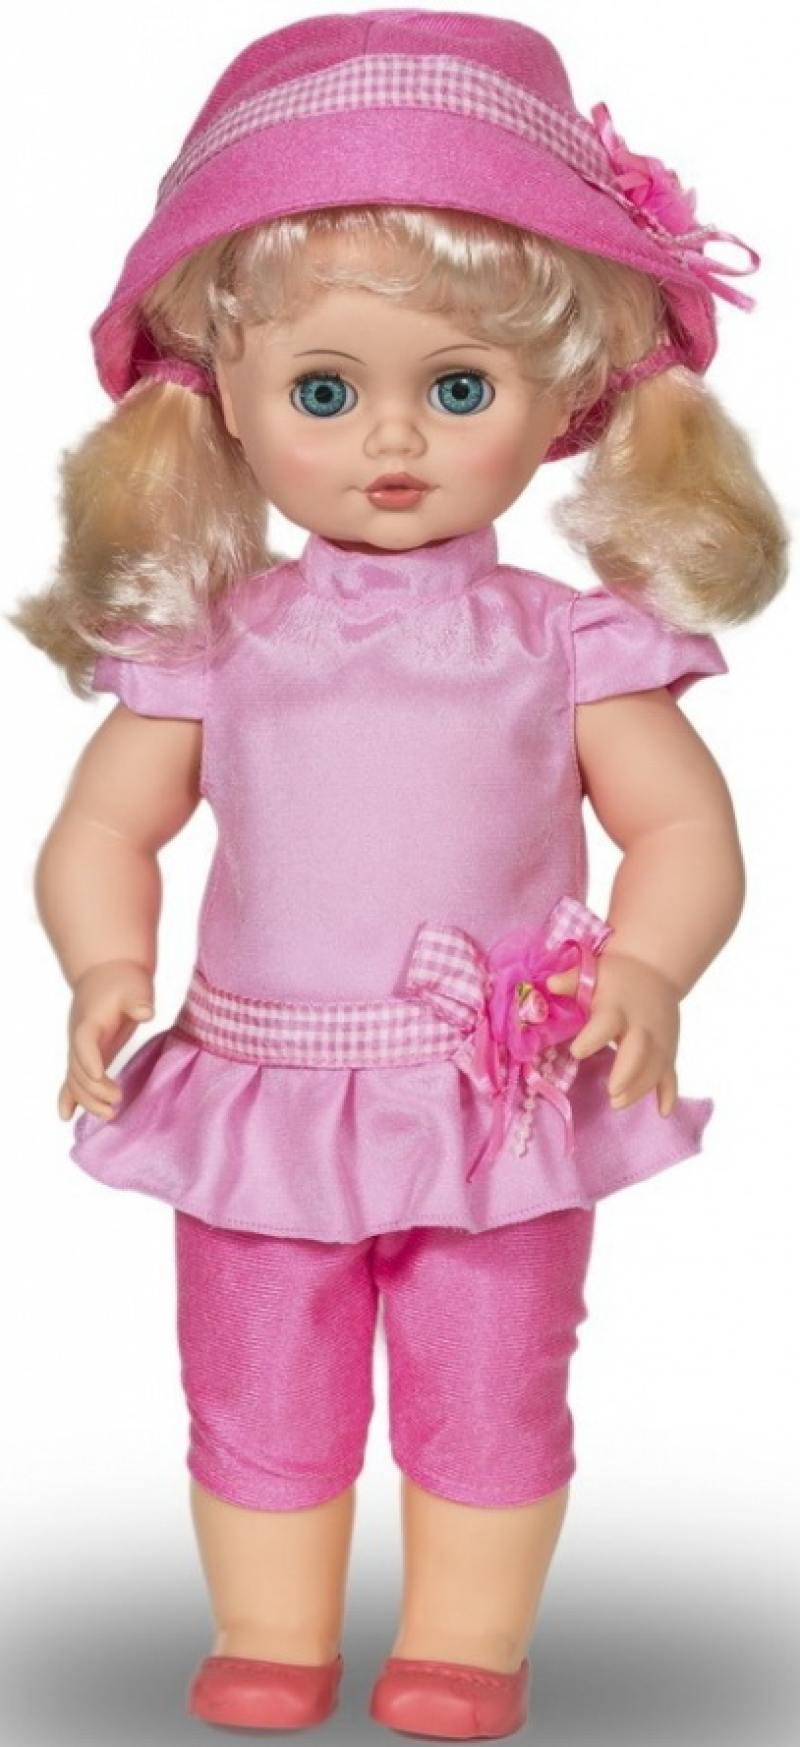 Кукла ВЕСНА Инна 49 (озвученная) В2257/о кукла весна лиза 16 озвученная в2144 о